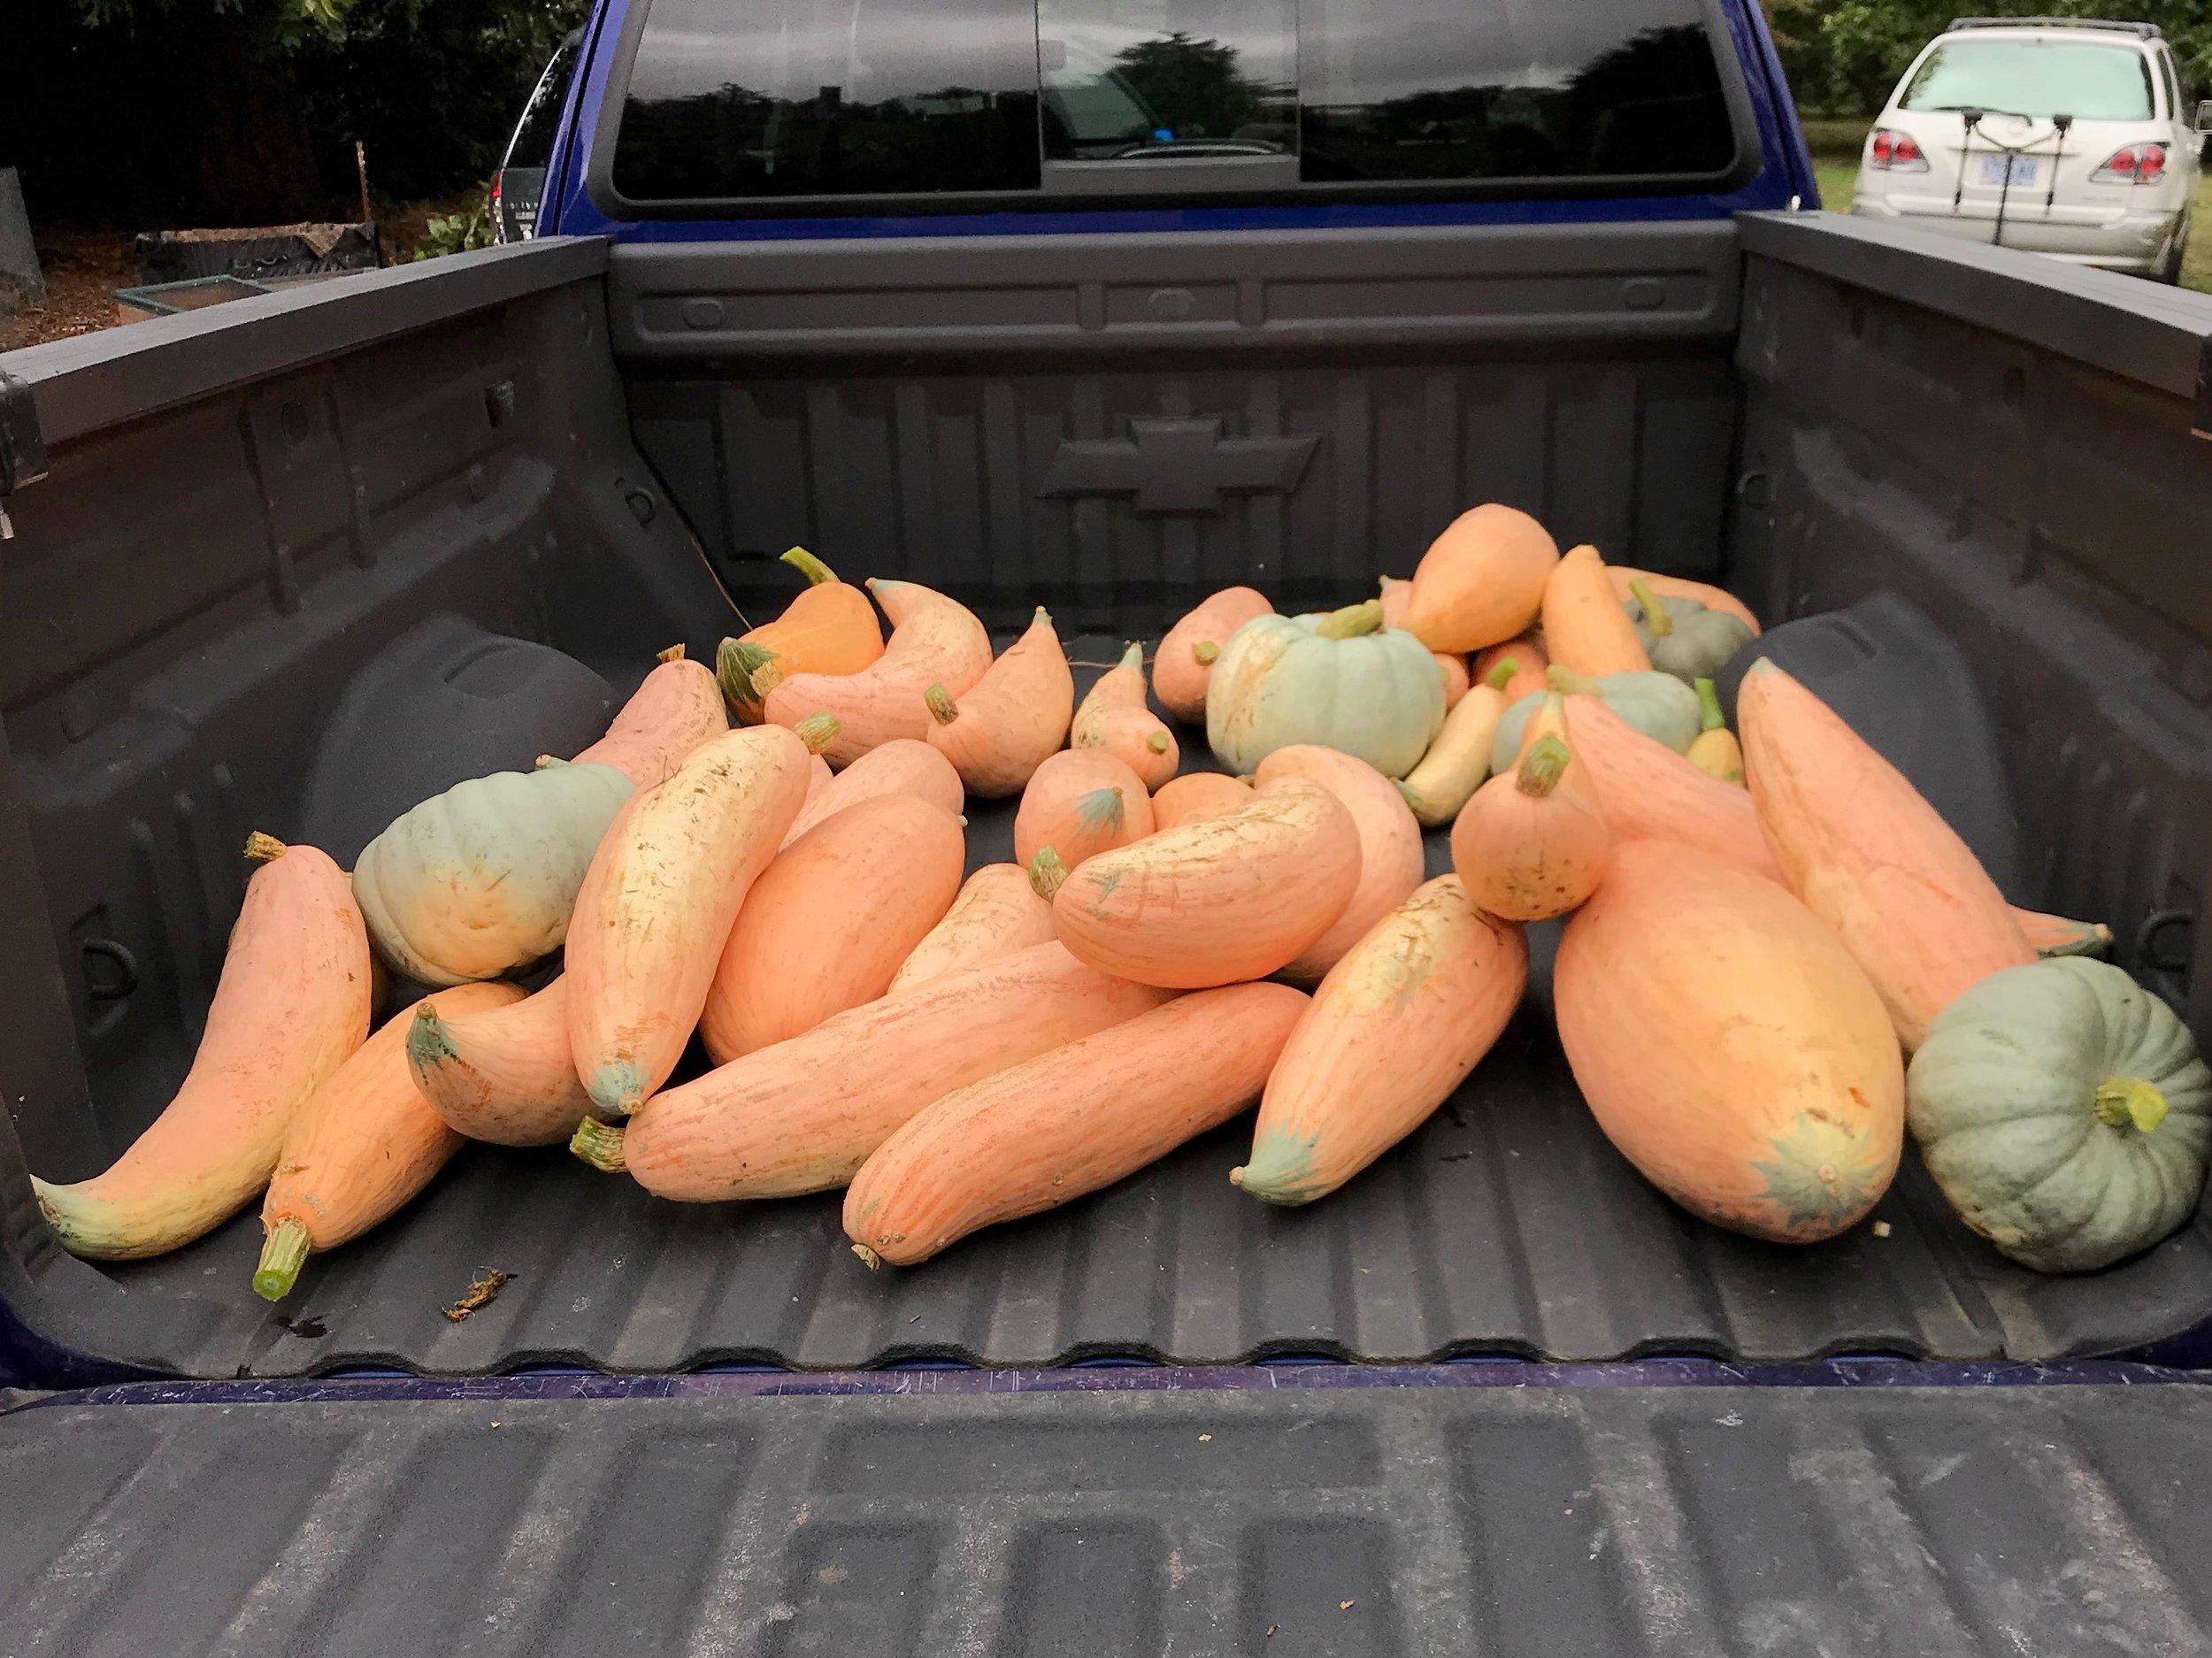 Demo Garden Harvest from 8/29/2019